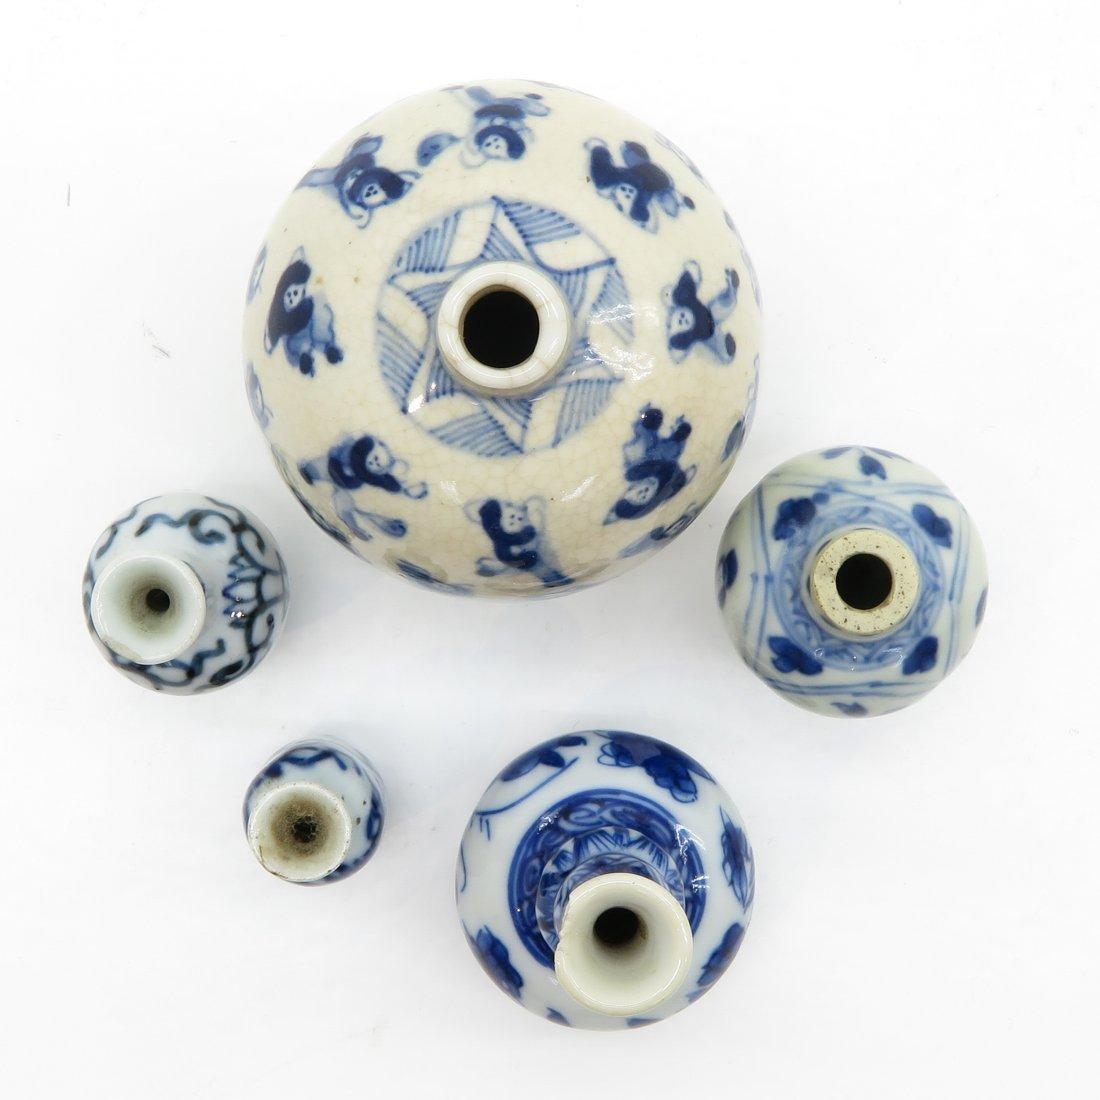 Diverse Lot of China Porcelain - 5